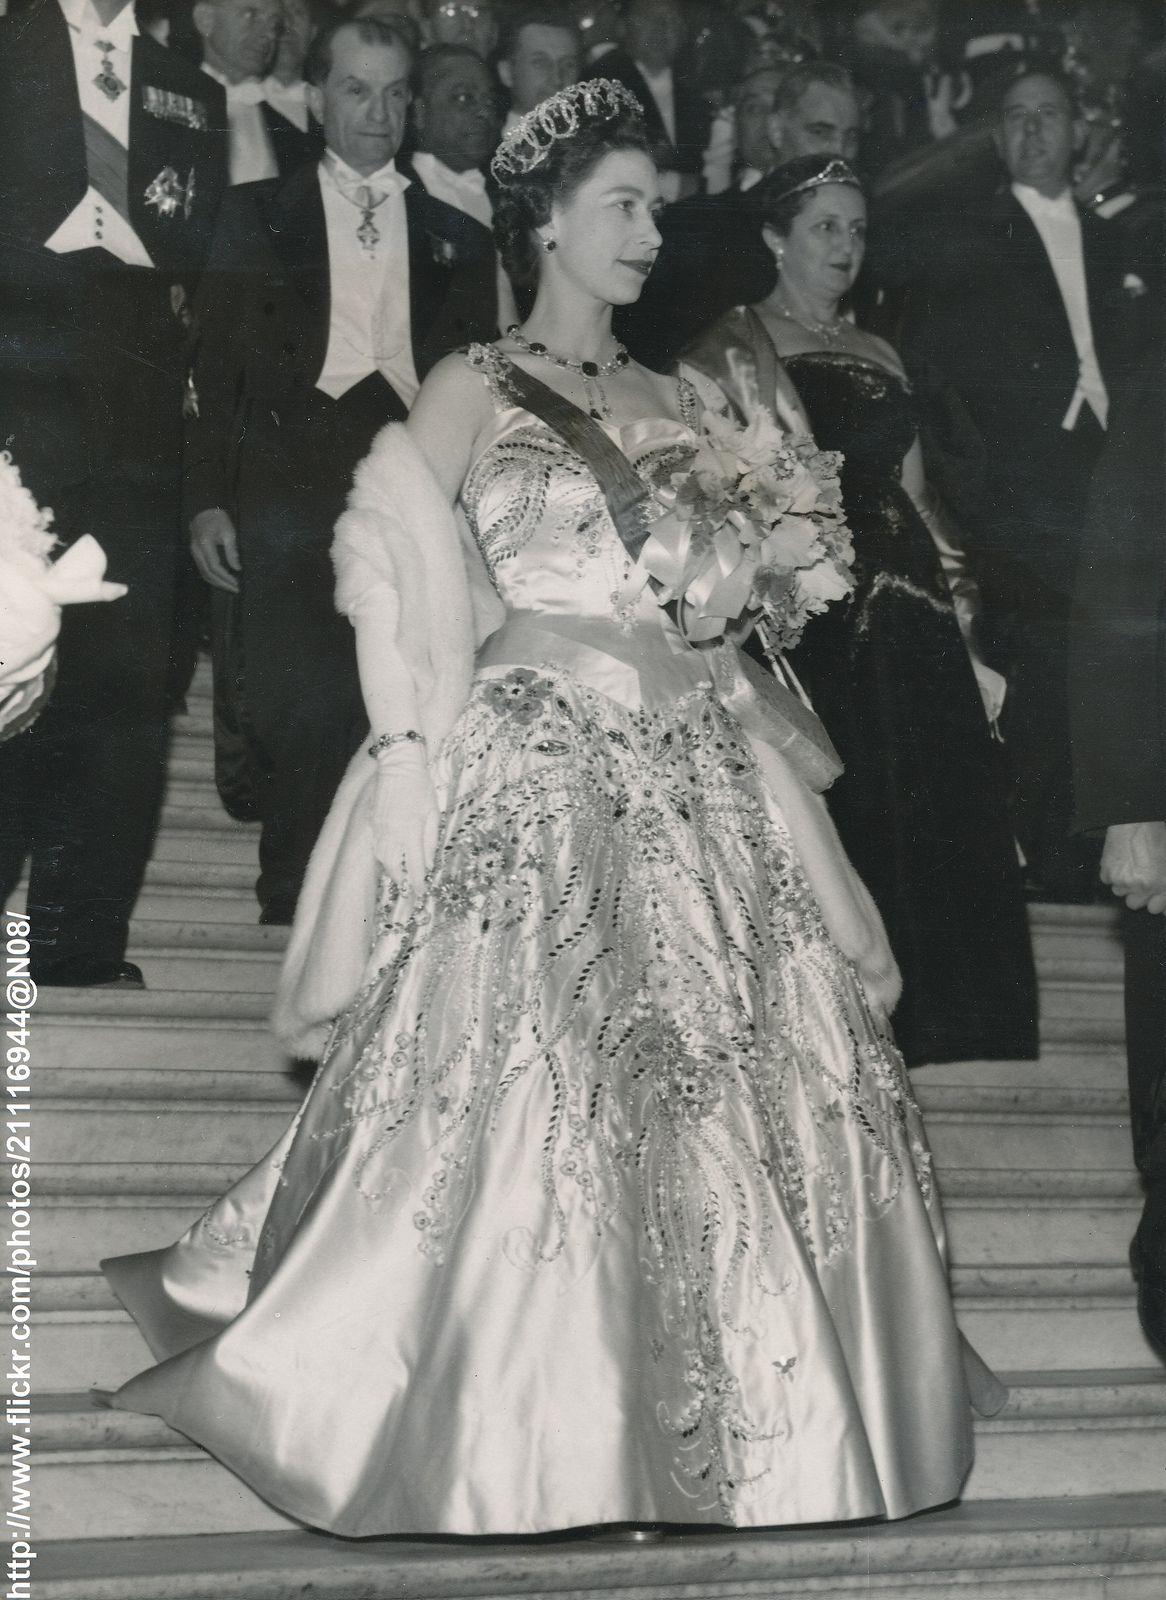 Queen Elizabeth II state visit Paris 1957 - Google Search   Queen ...